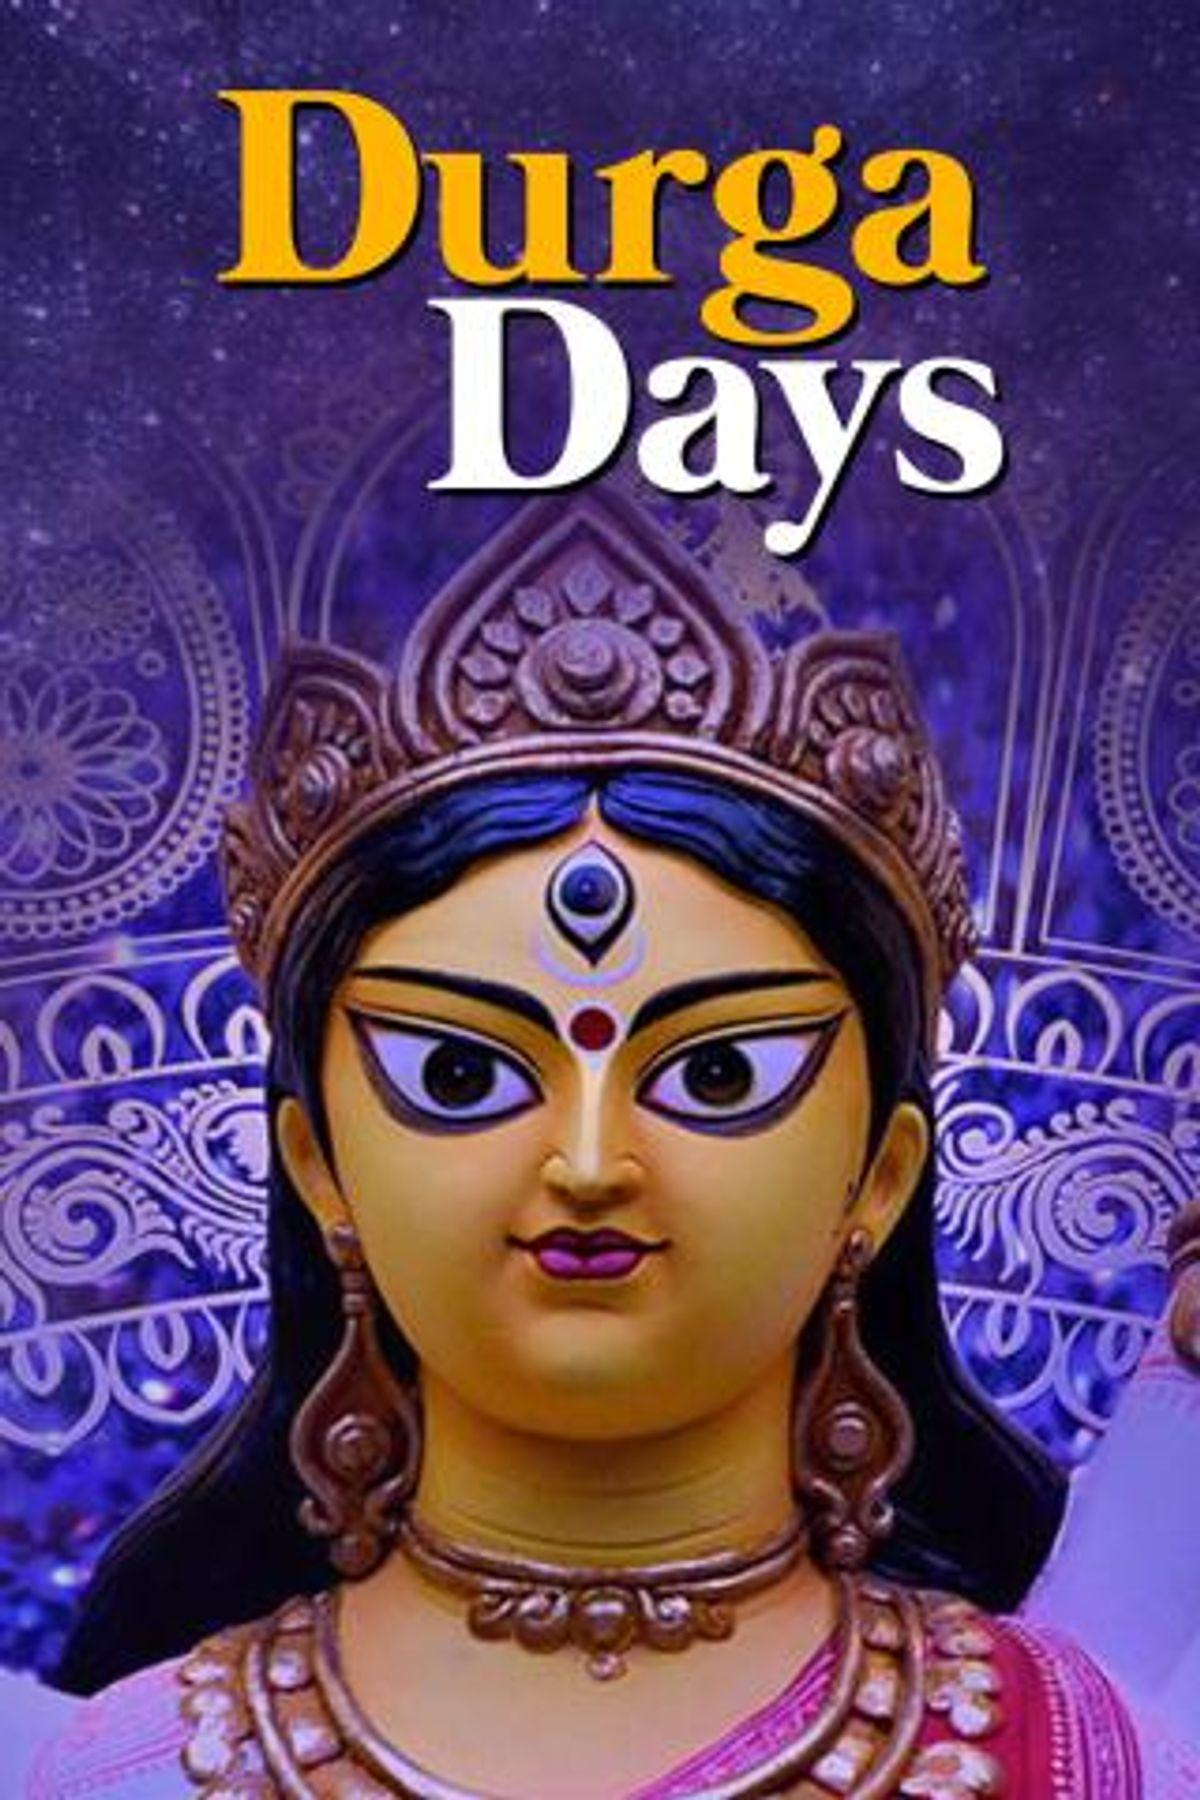 Durga Days